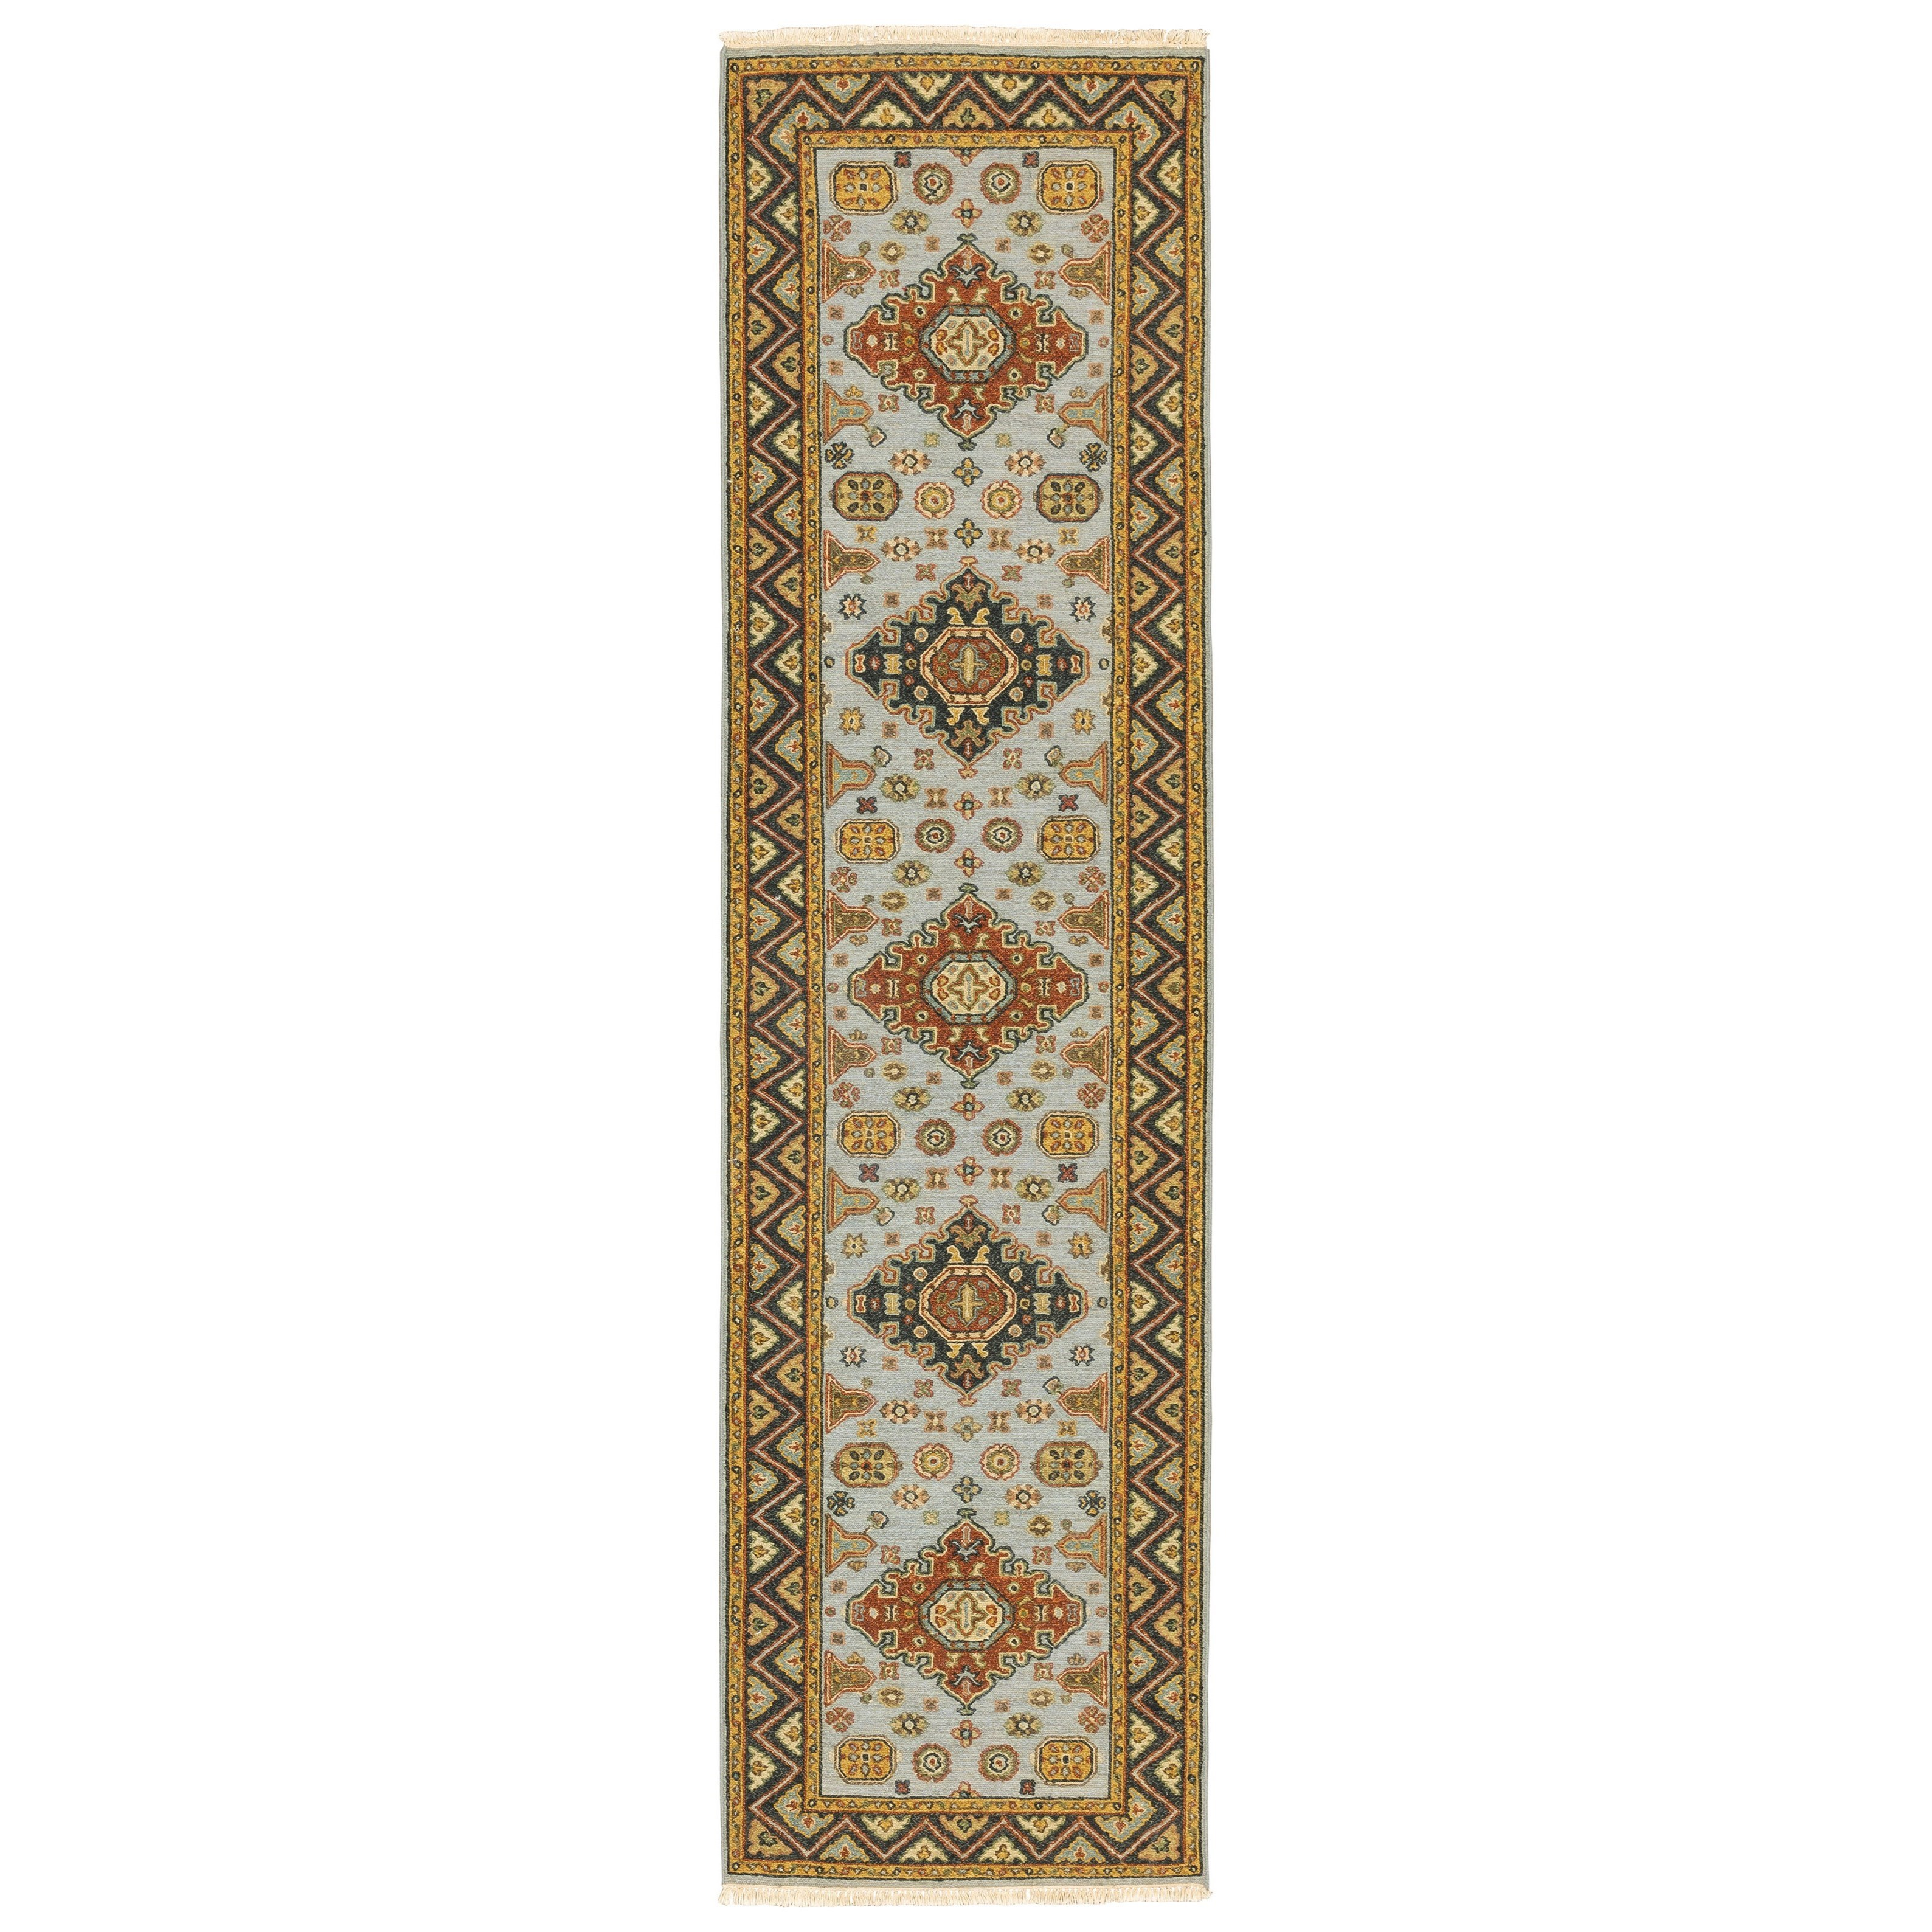 "Angora 2' 6"" X 10' Runner Rug by Oriental Weavers at Darvin Furniture"